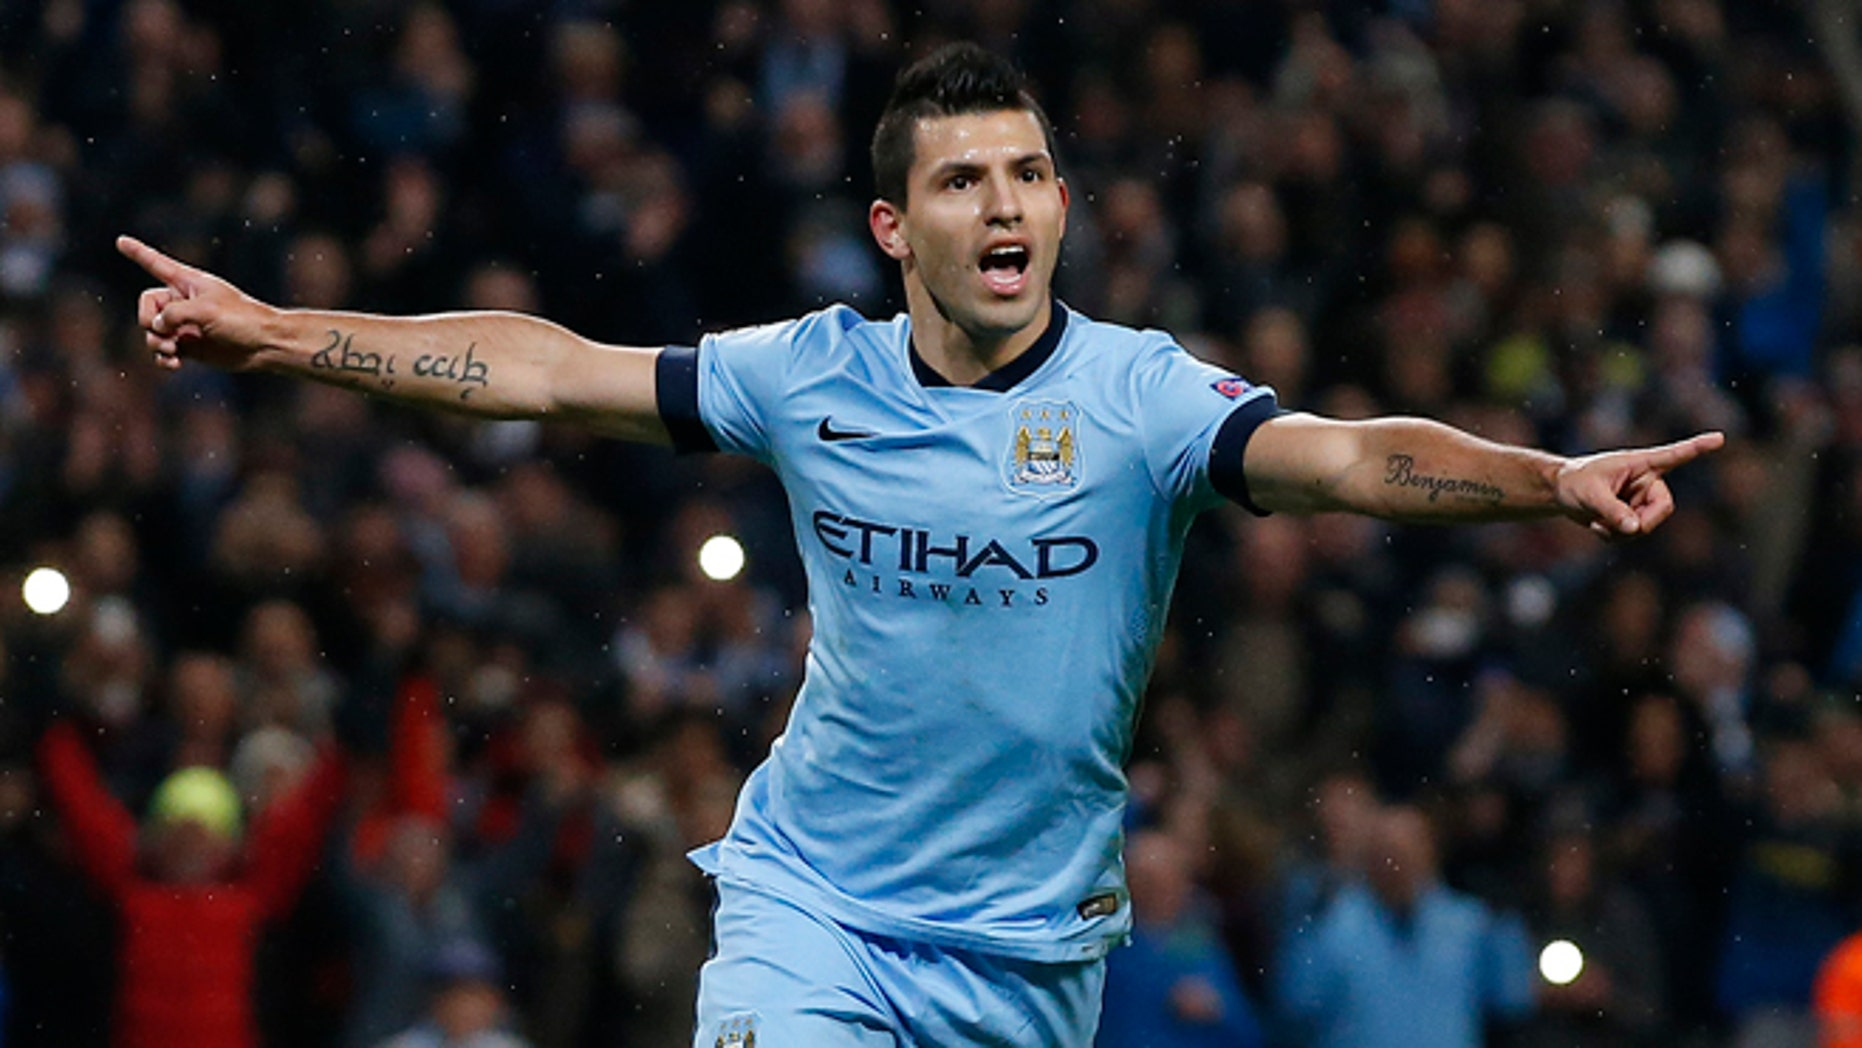 Manchester City's Sergio Aguero celebrates after scoring a penalty on Tuesday, Nov. 25, 2014.